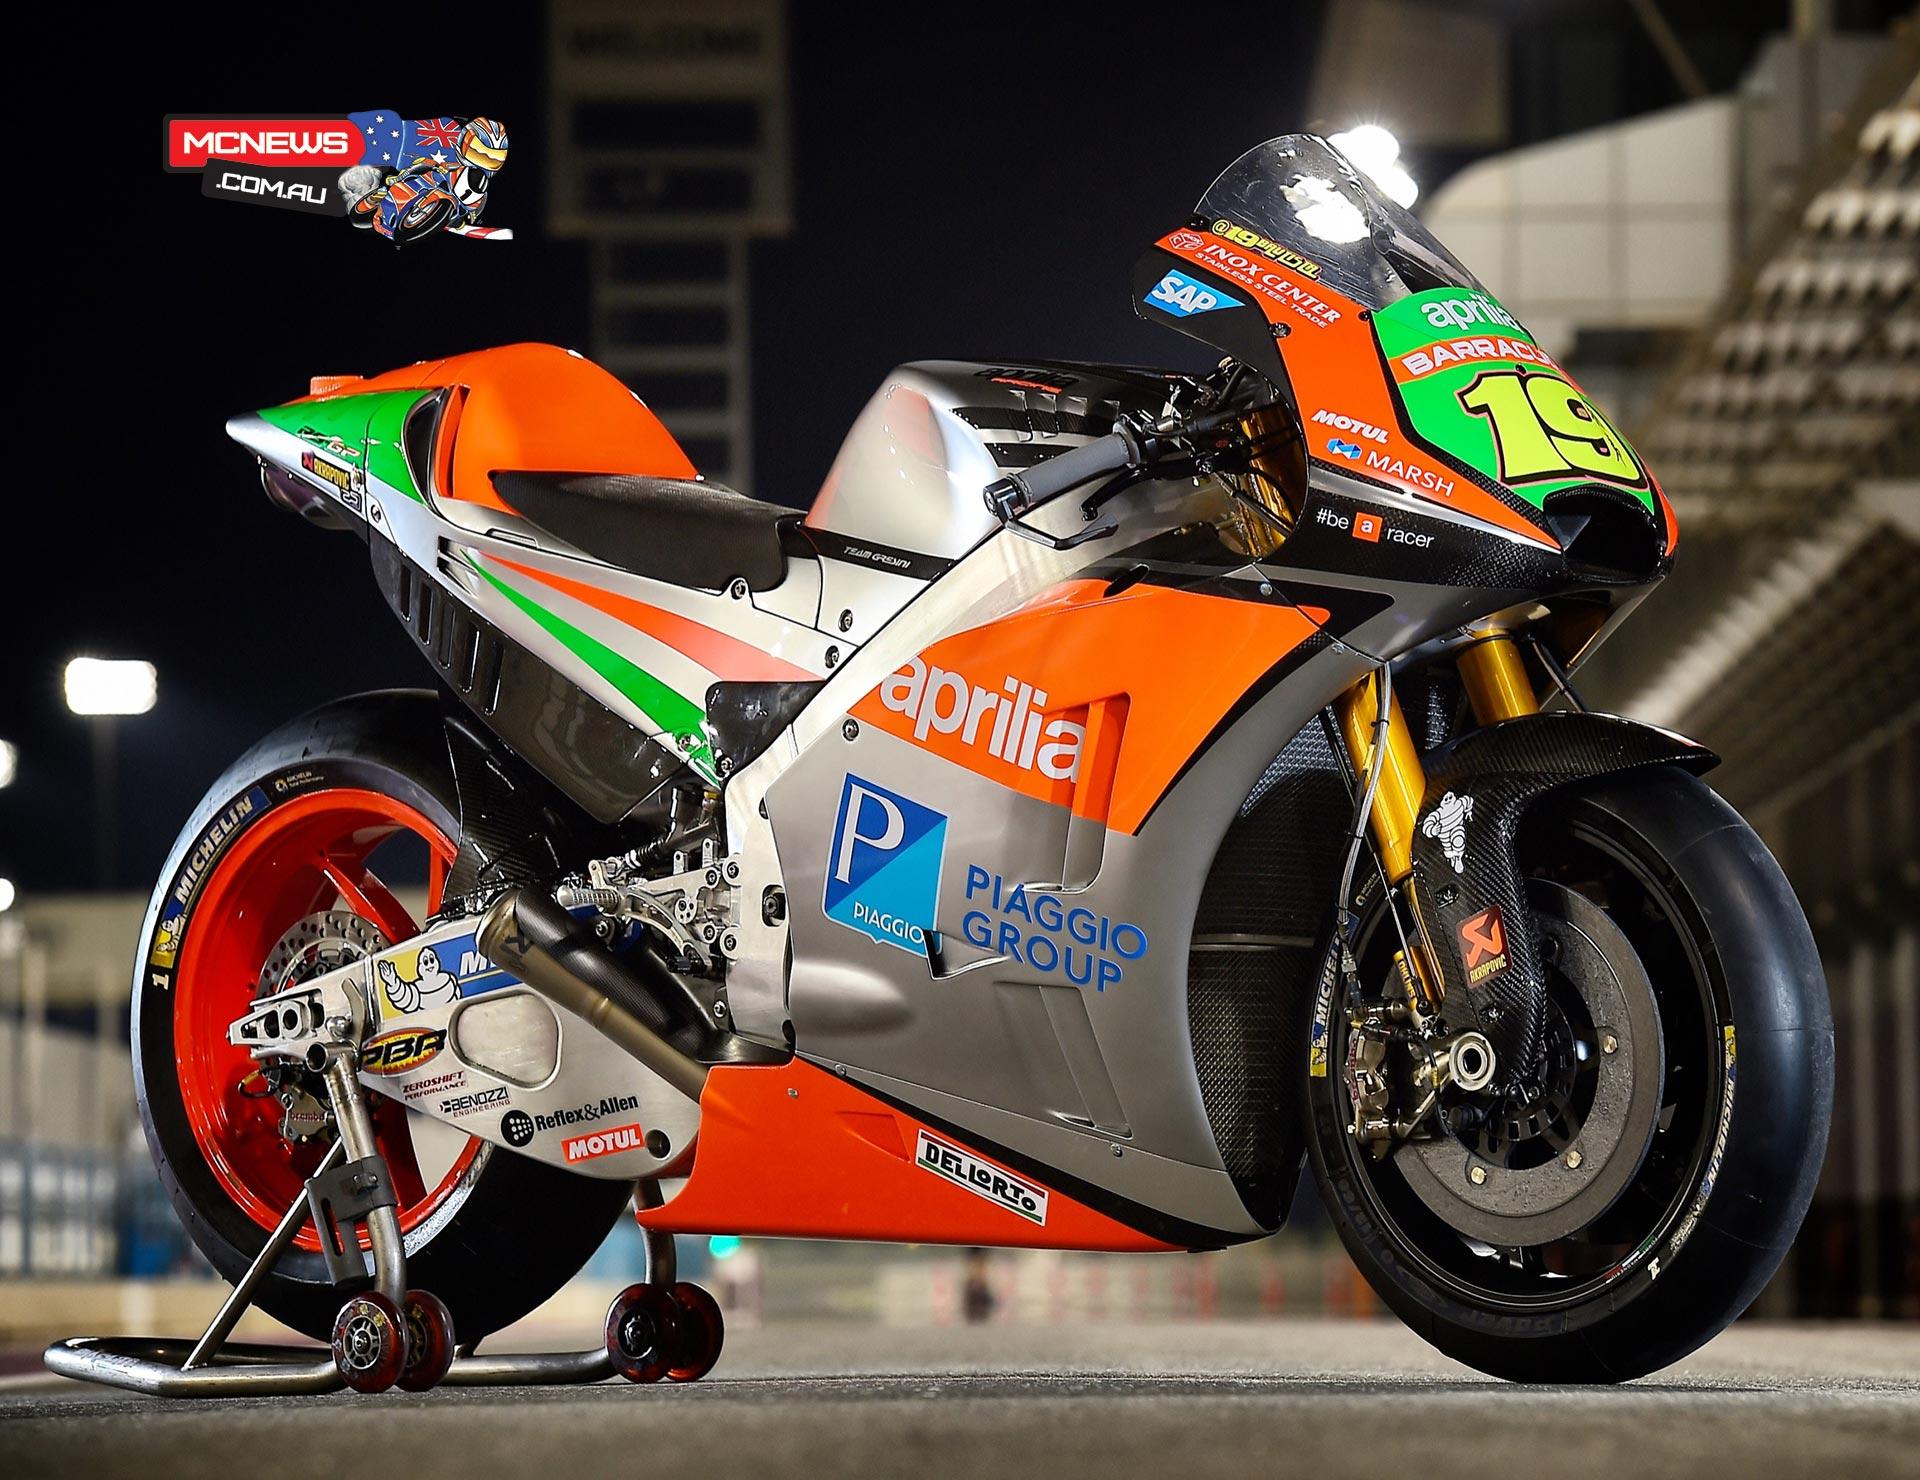 Wallpaper : sports, sport, vehicle, Moto GP, Marc Marquez